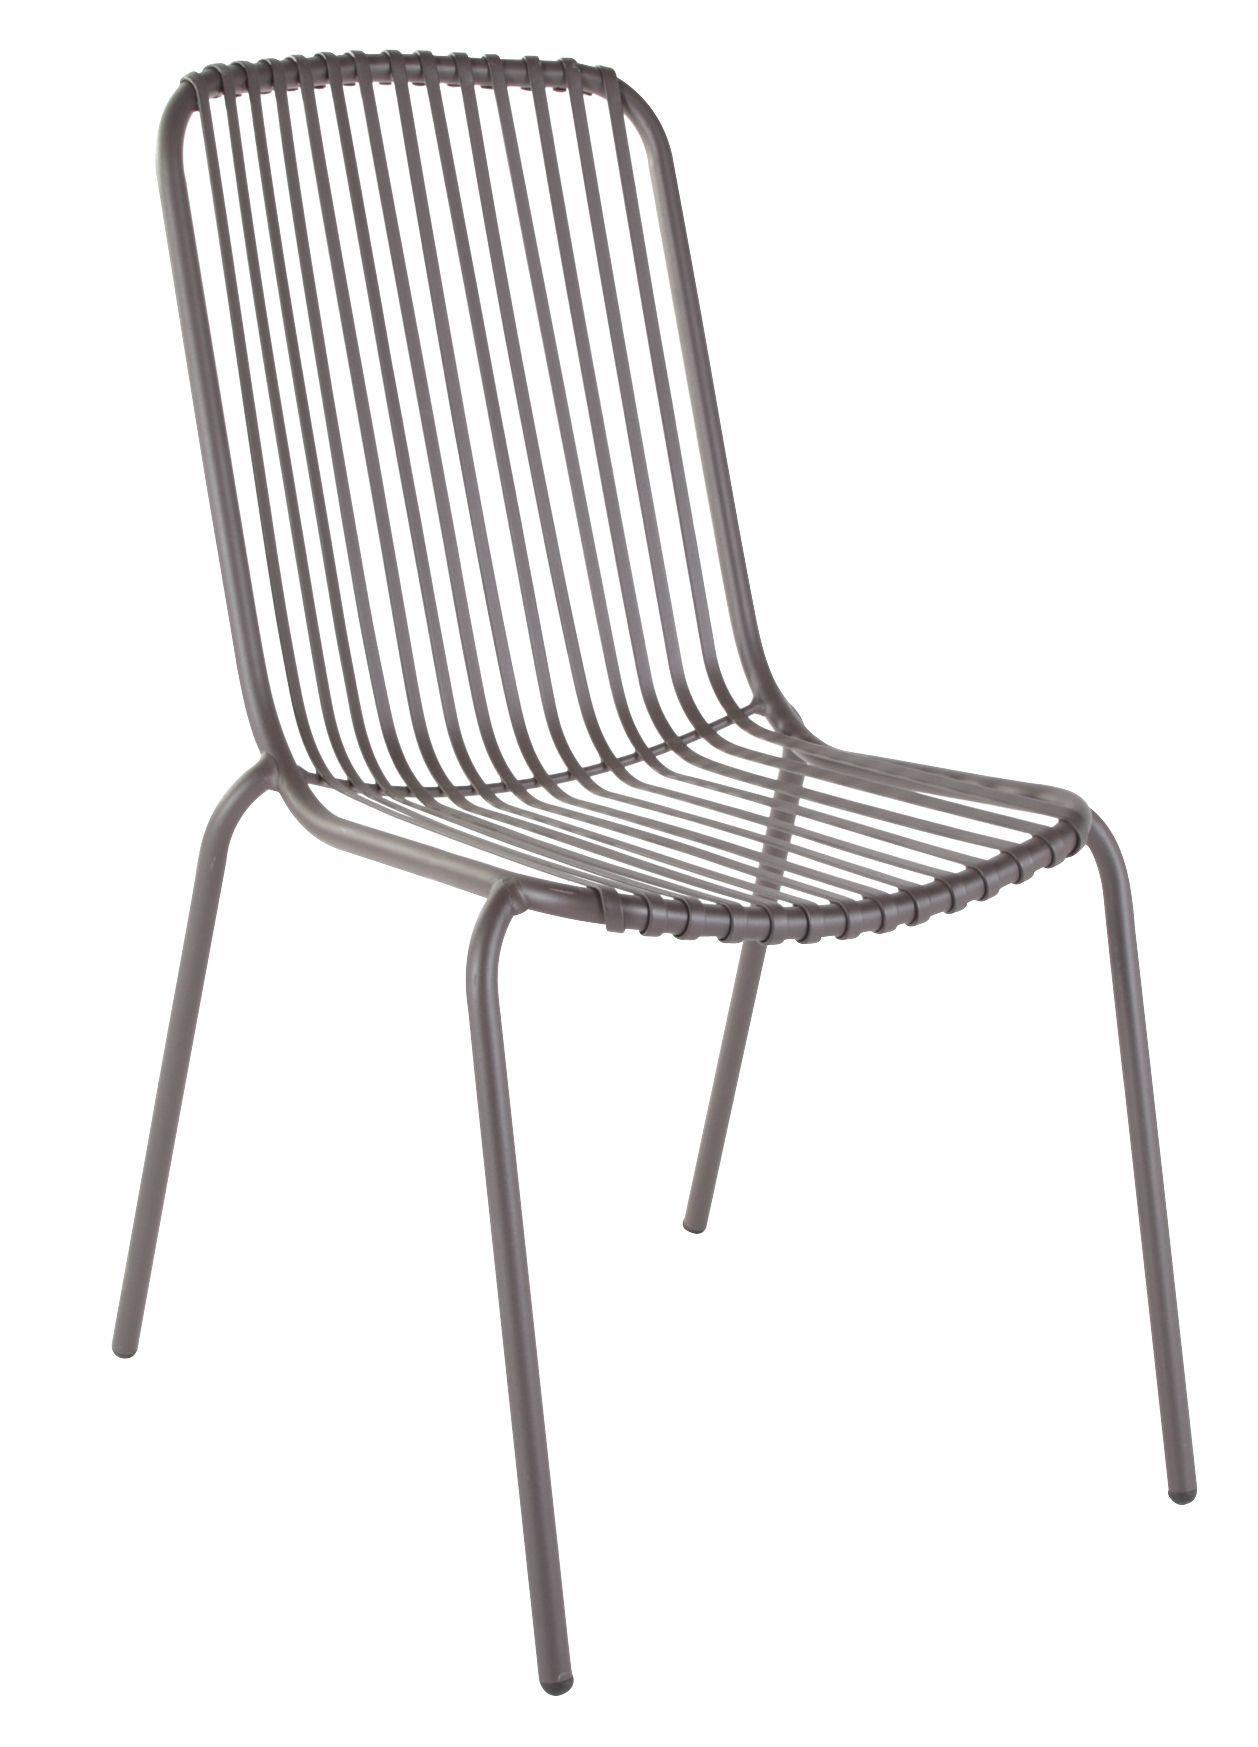 Plastic Metal Chairs. Plastic Metal Chairs R